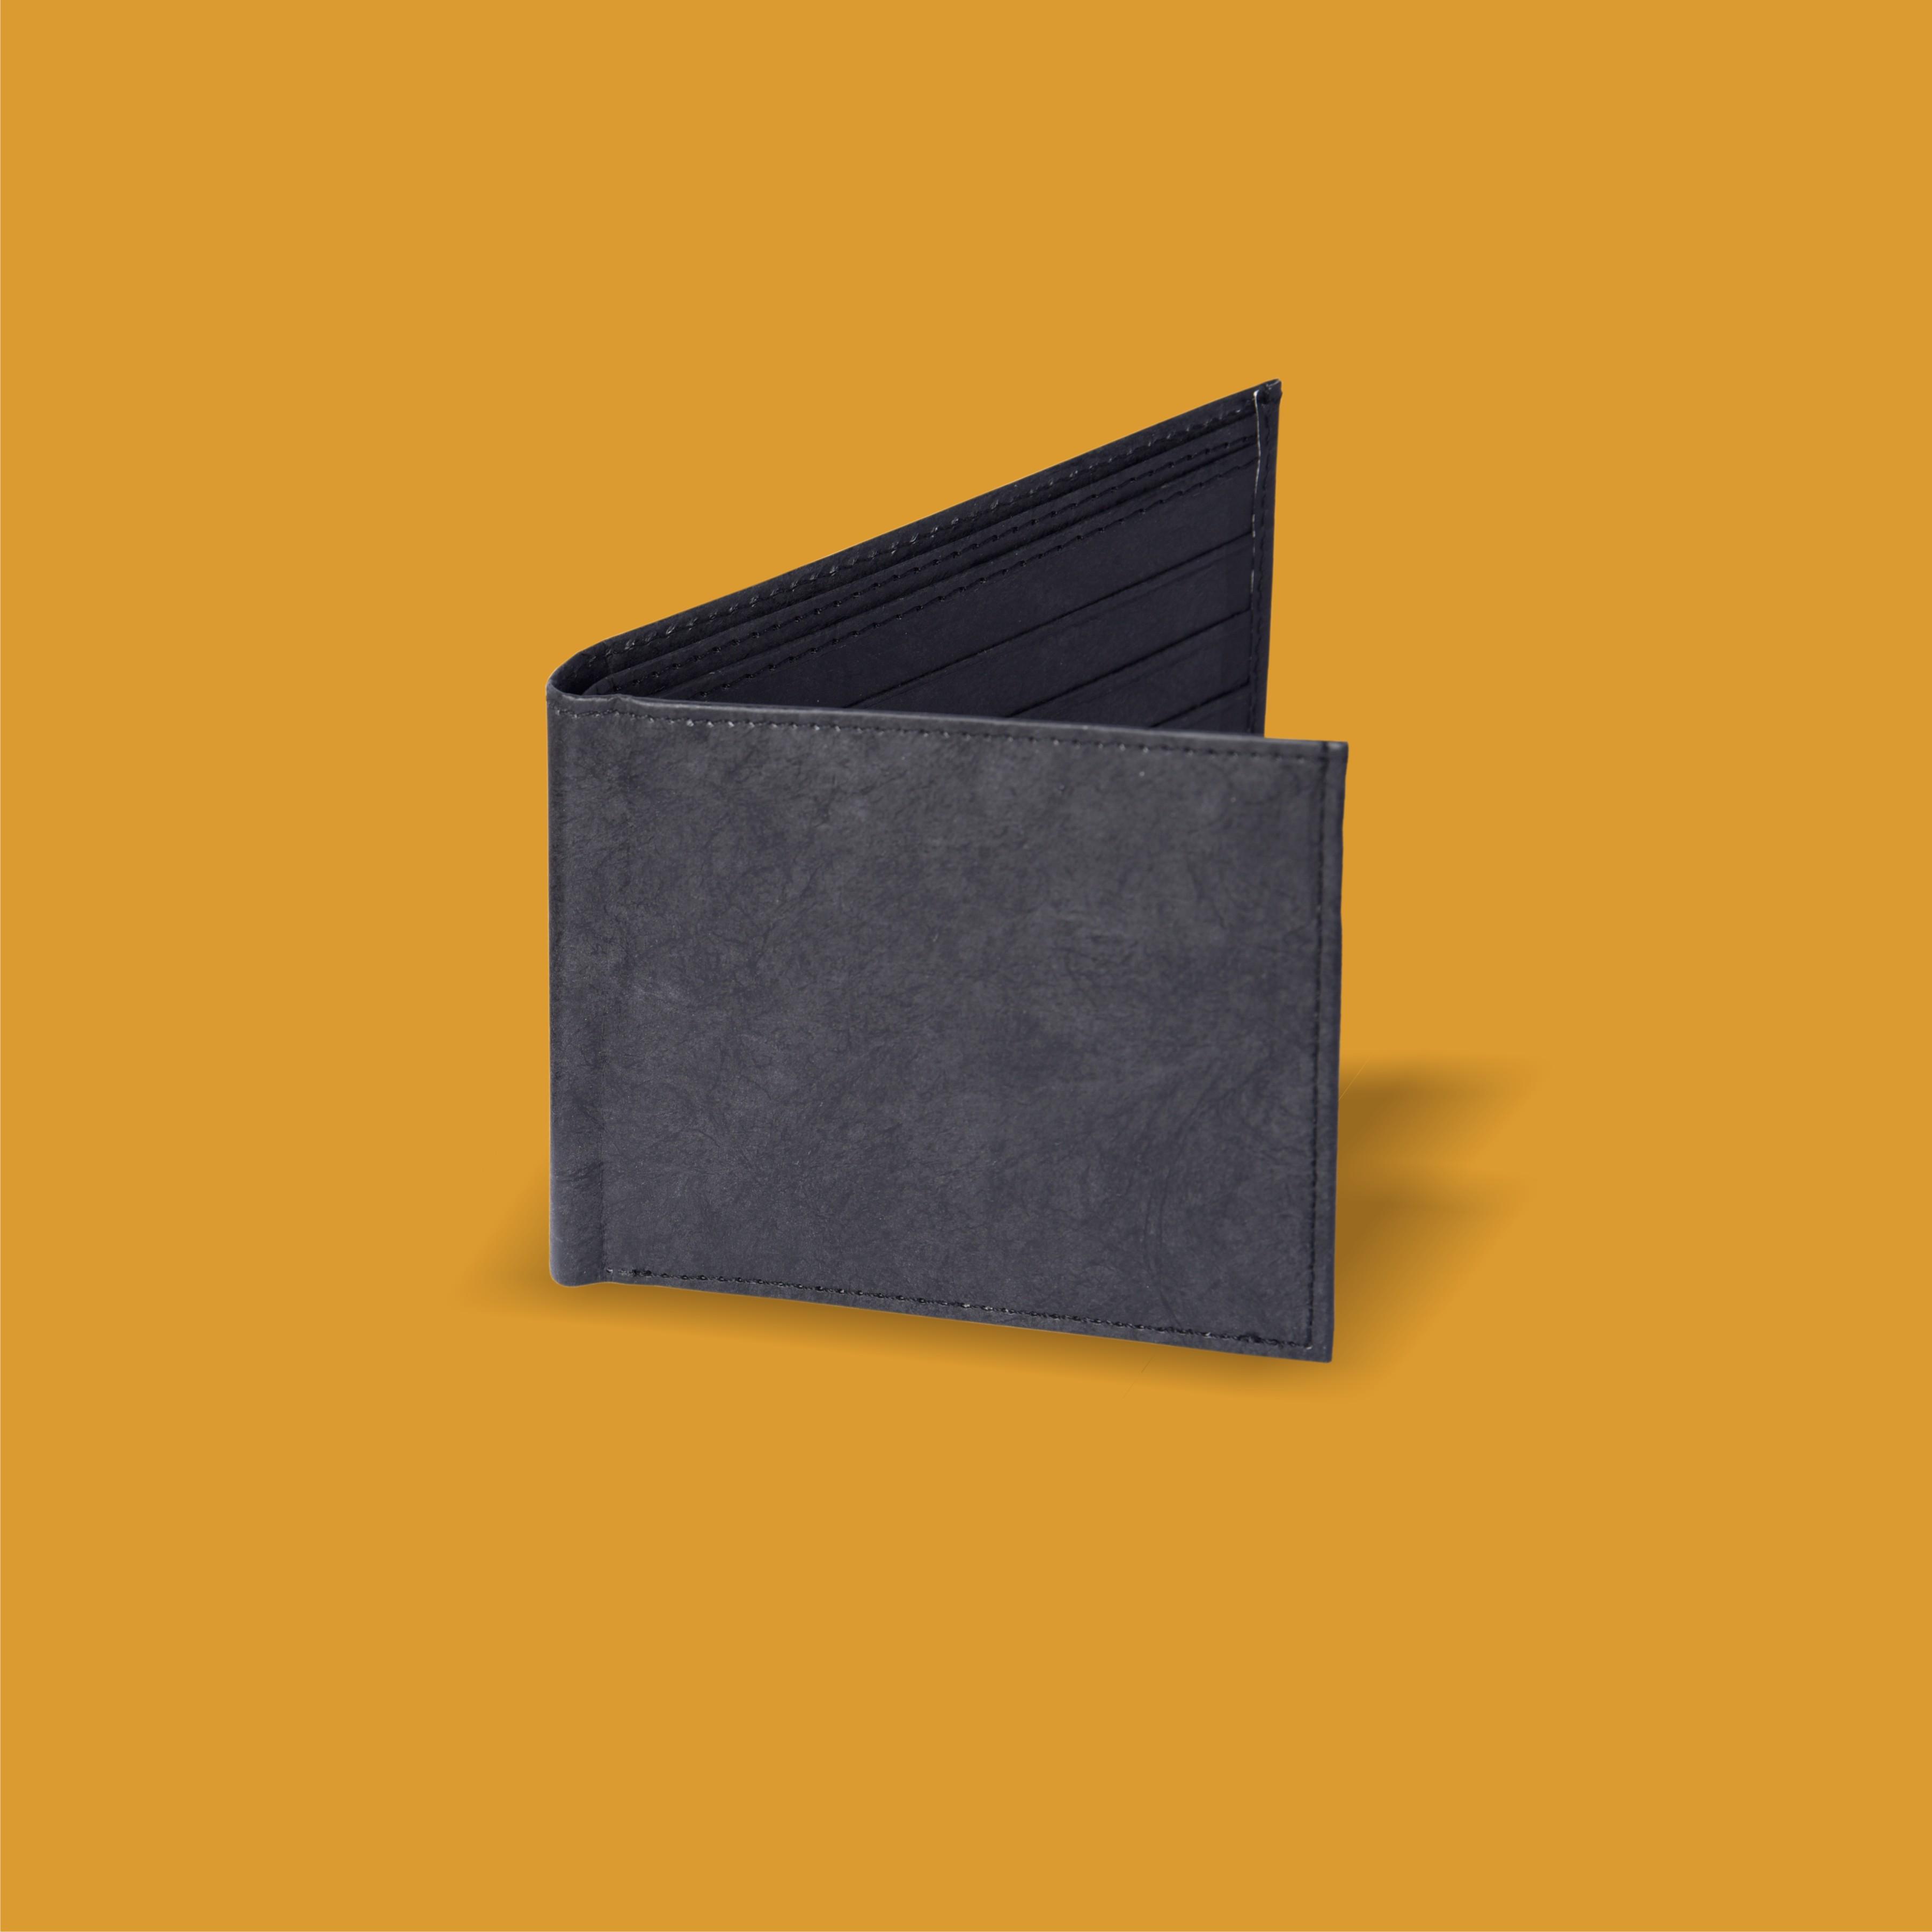 Black Stitched Wallet